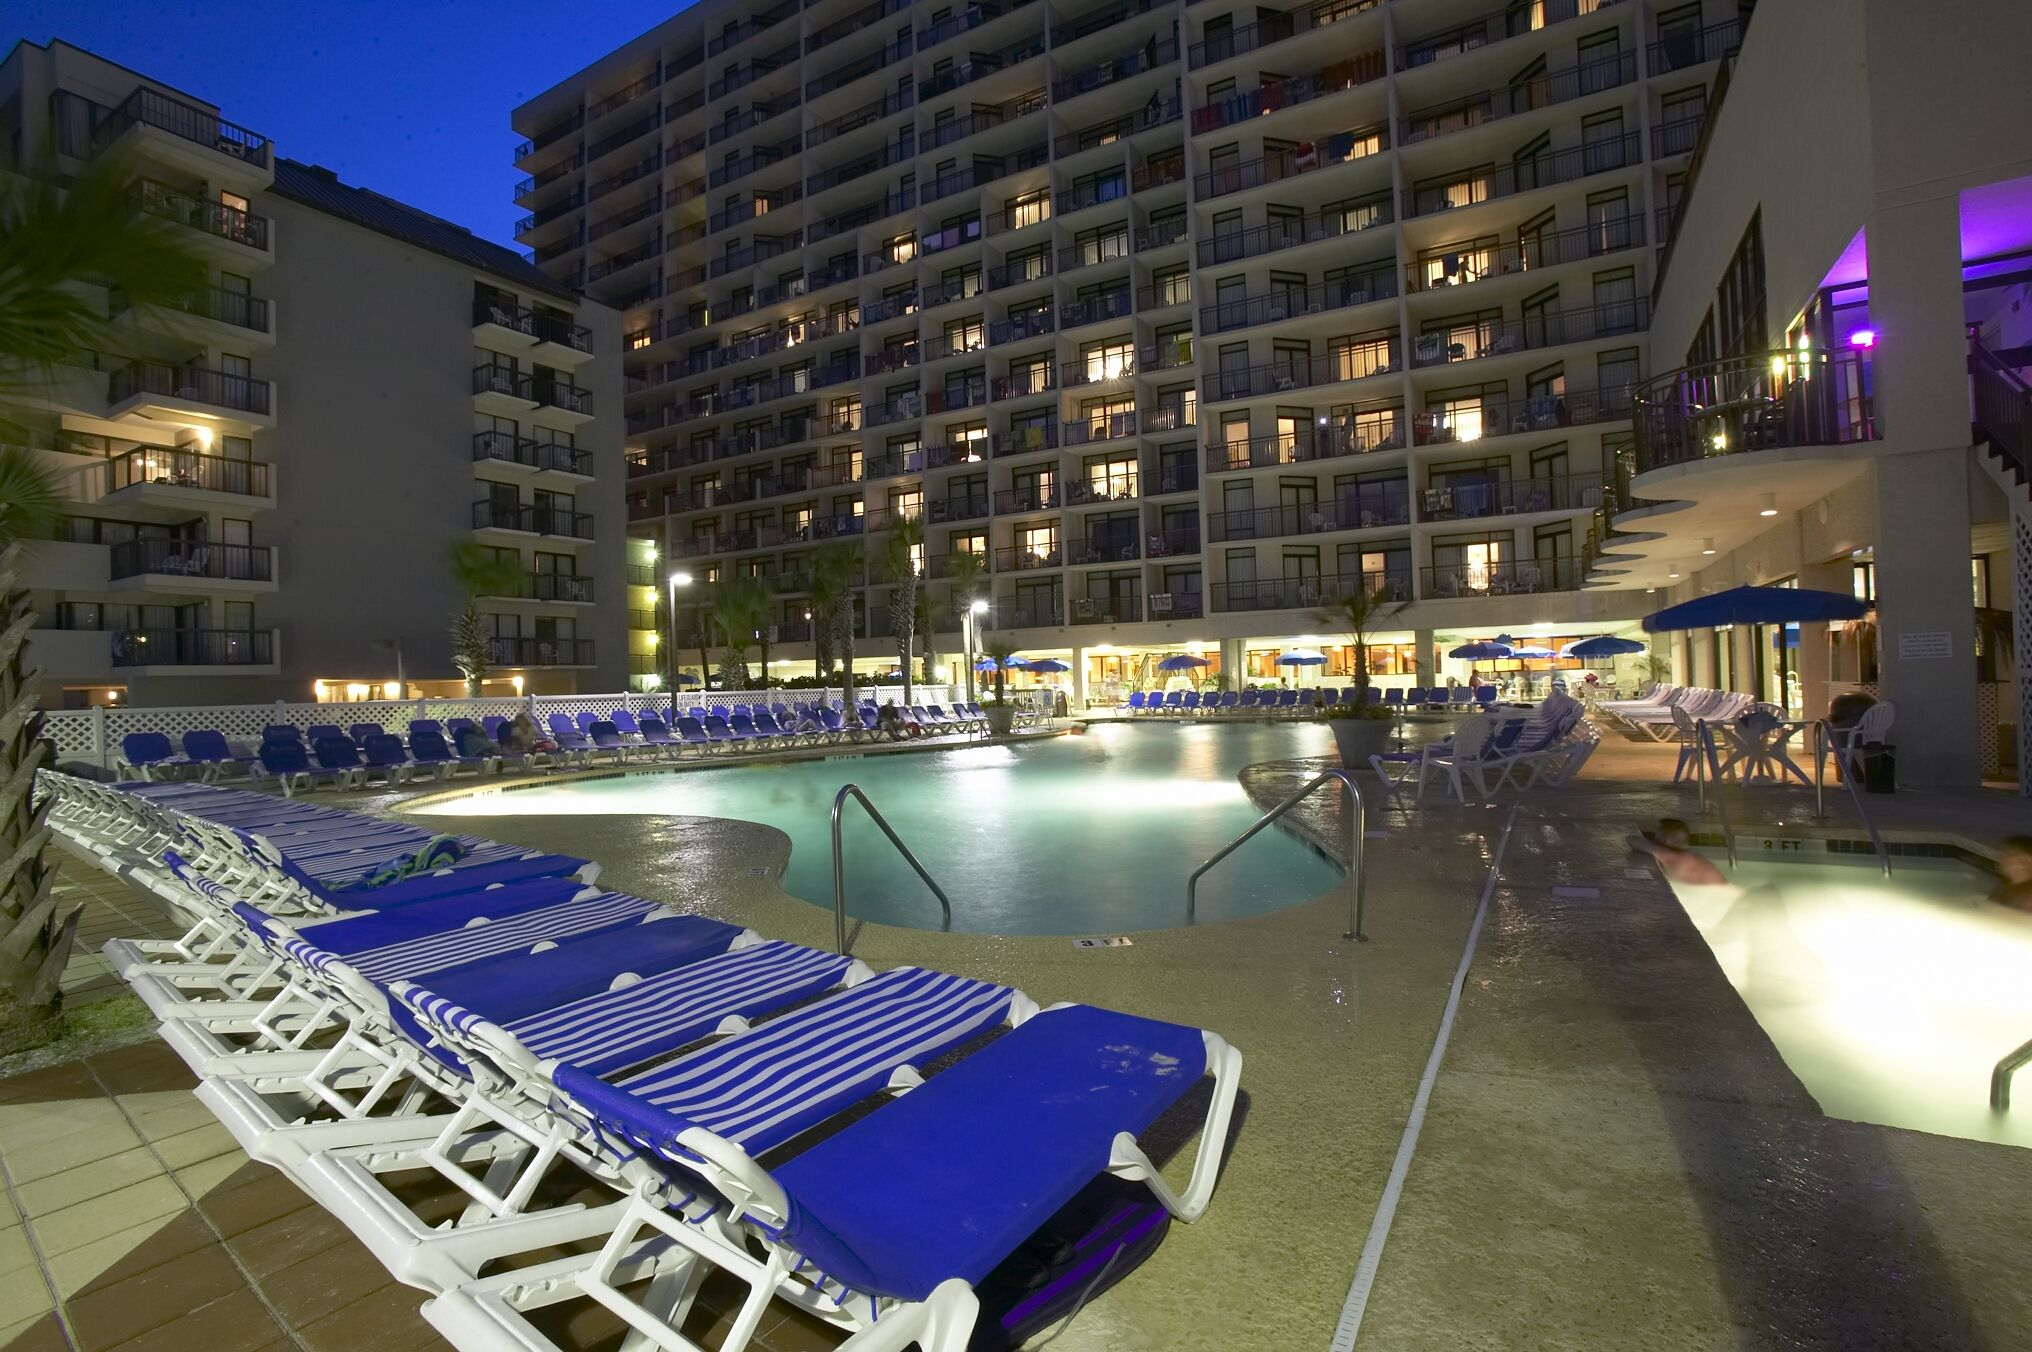 Long Bay Resort In North Myrtle Beach Myrtle Beach Resorts Myrtle Beach Resort